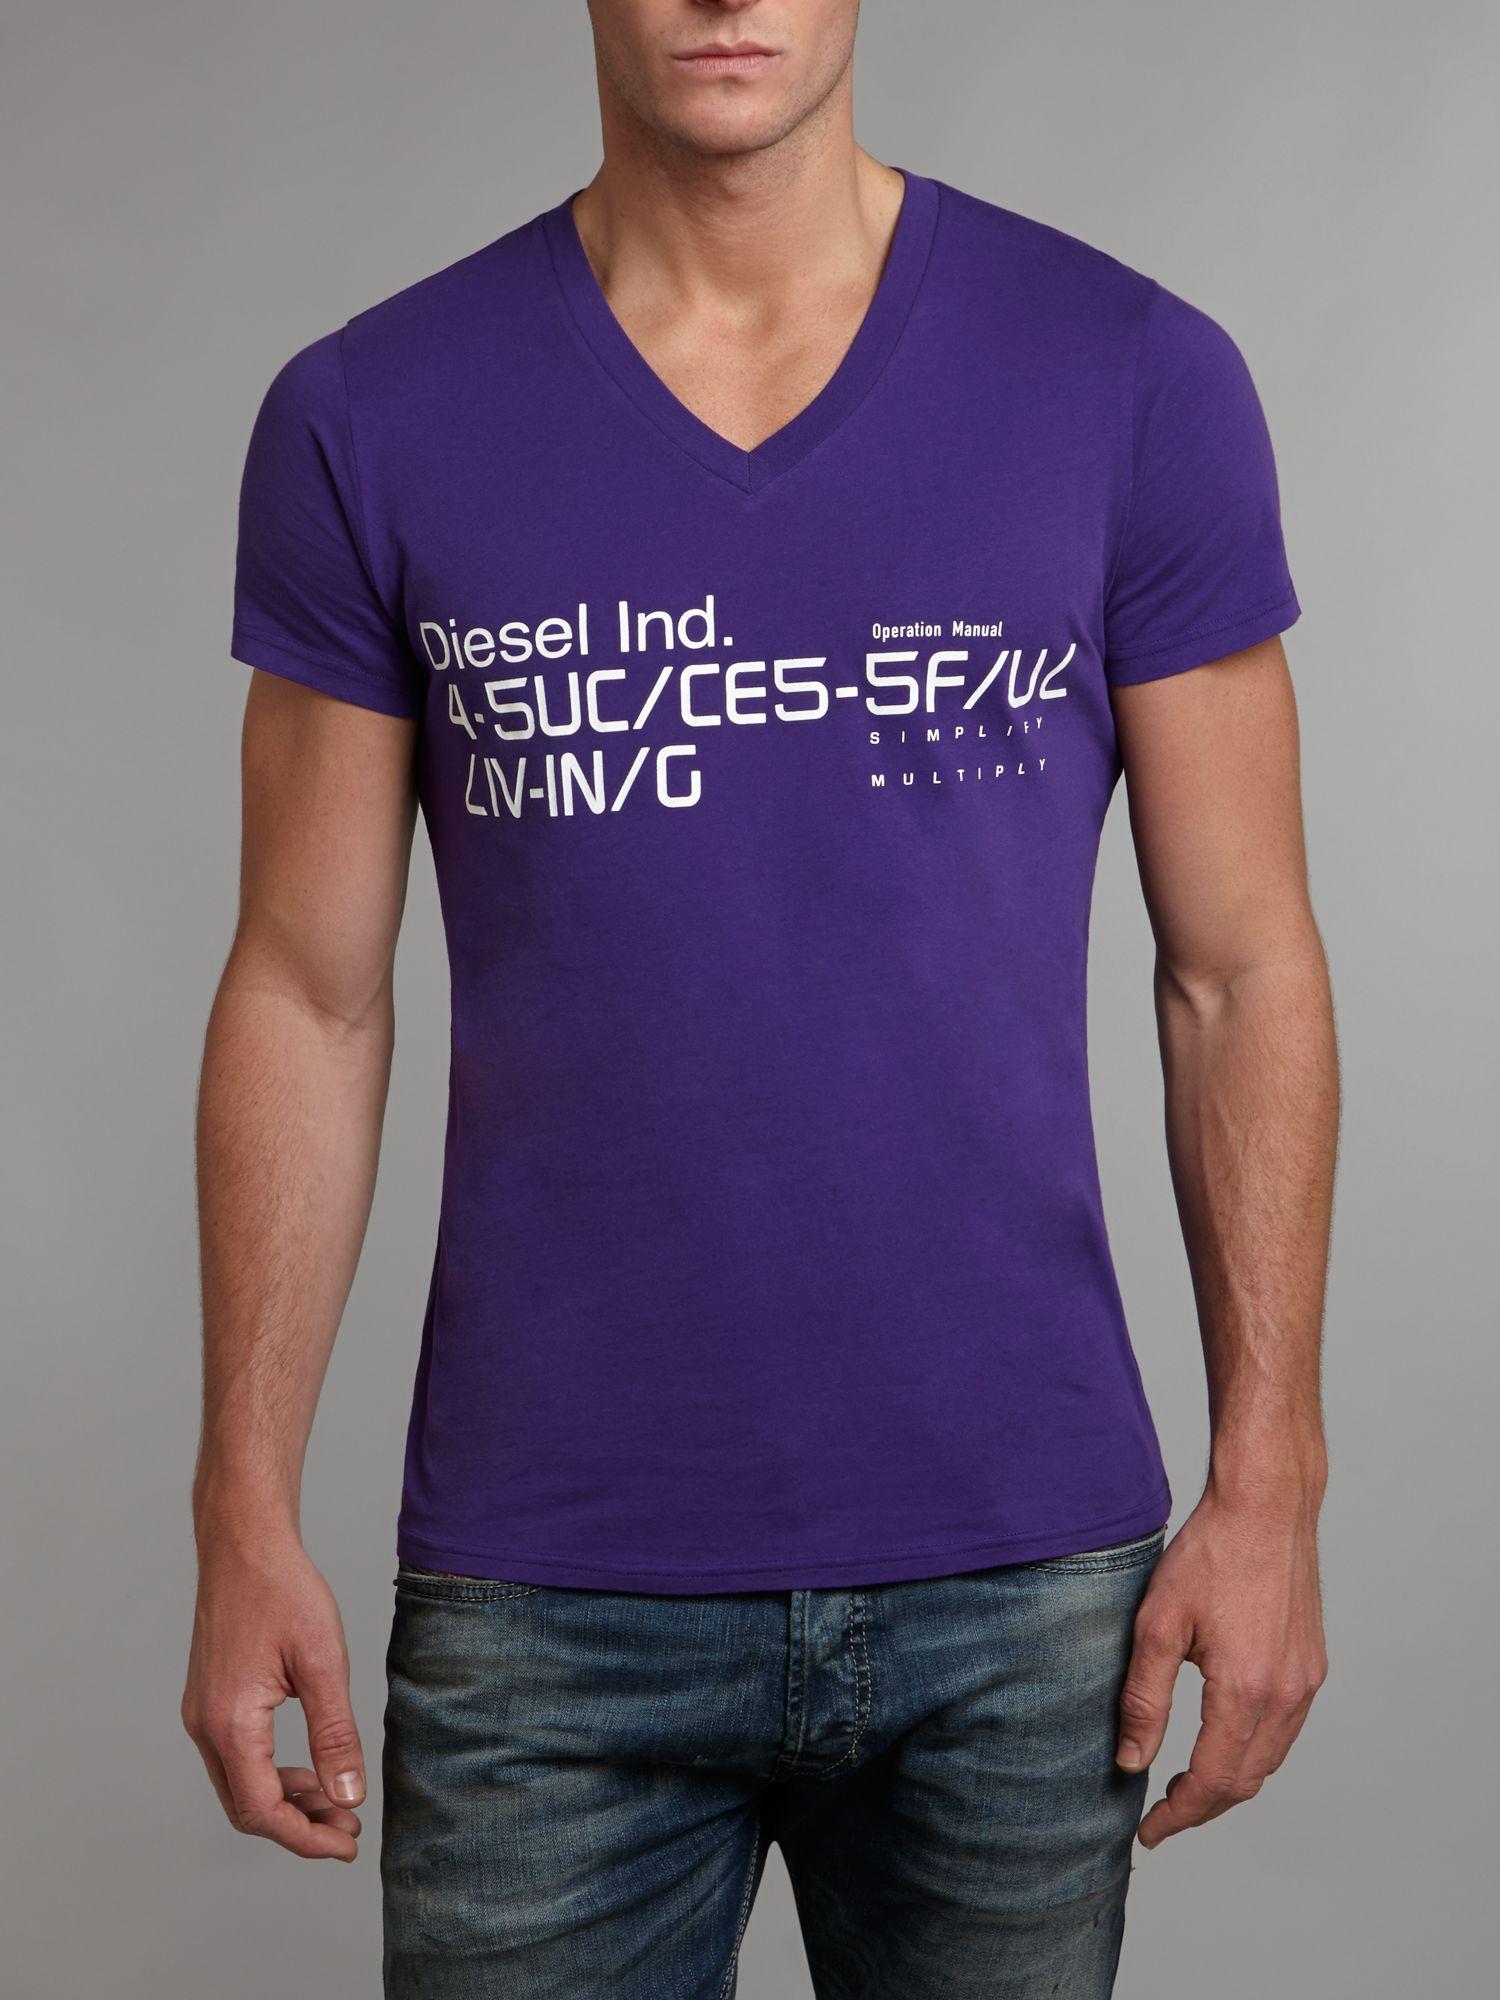 Diesel V Neck Successful Living Tshirt in Purple for Men ...